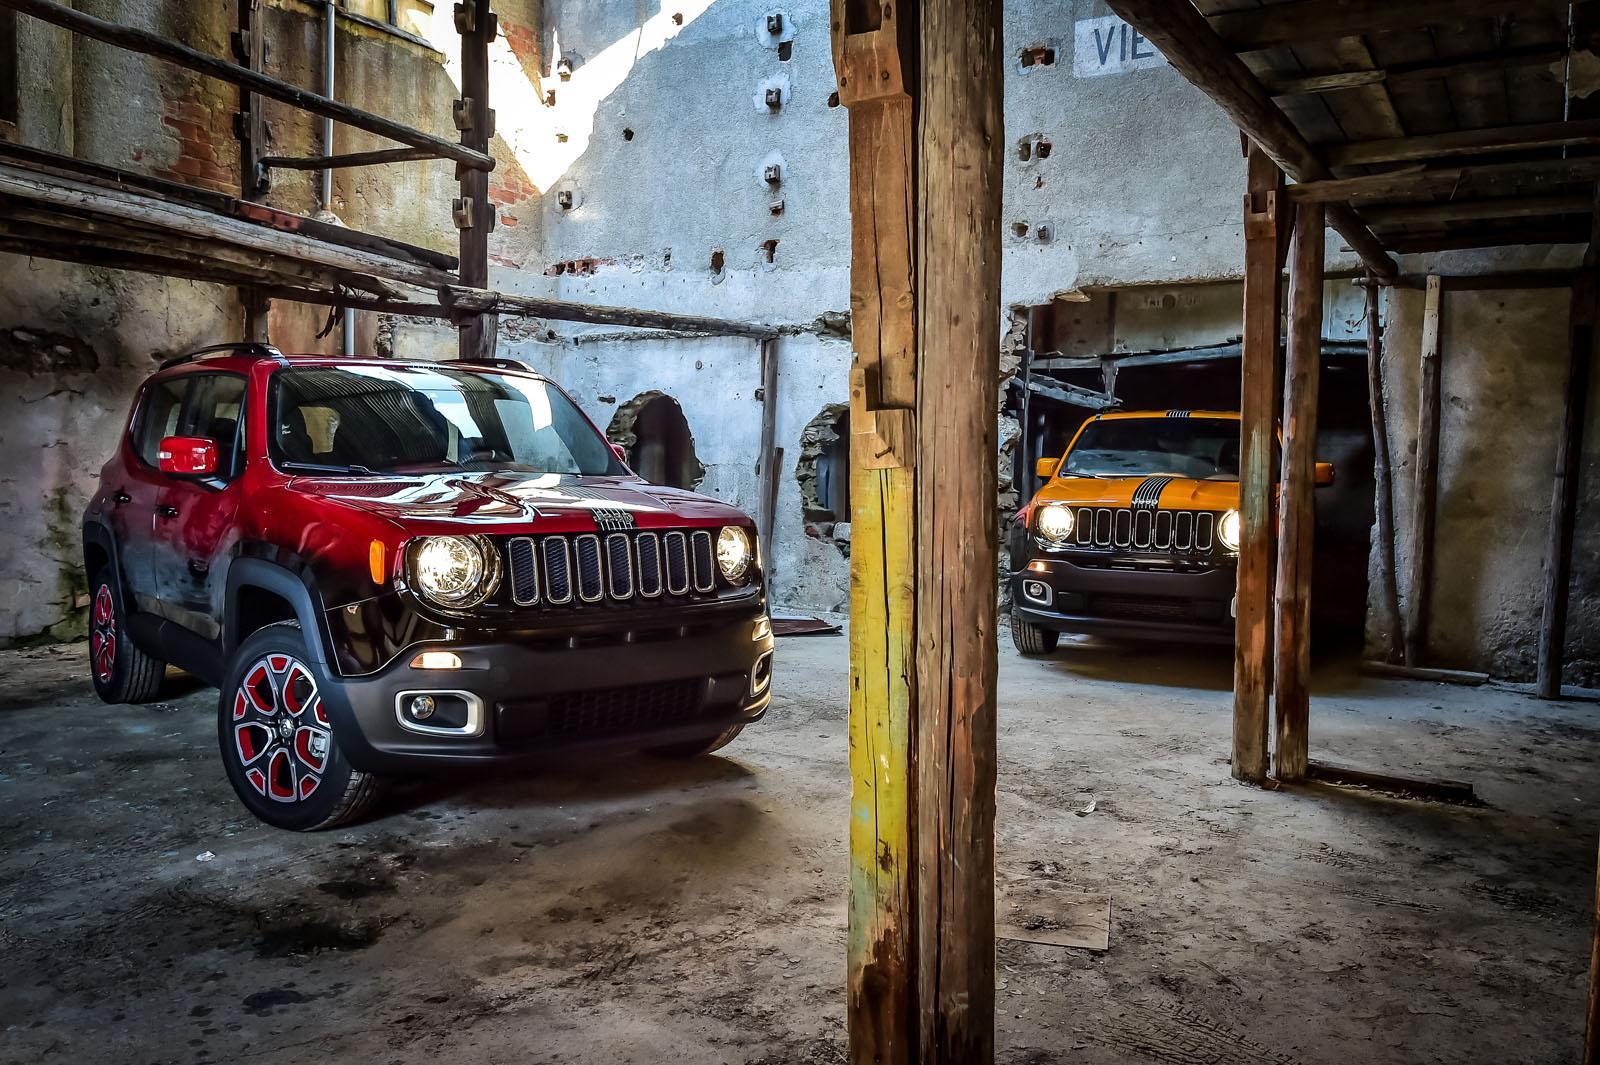 garage-italia-customs-jeep-renegade-001.jpg